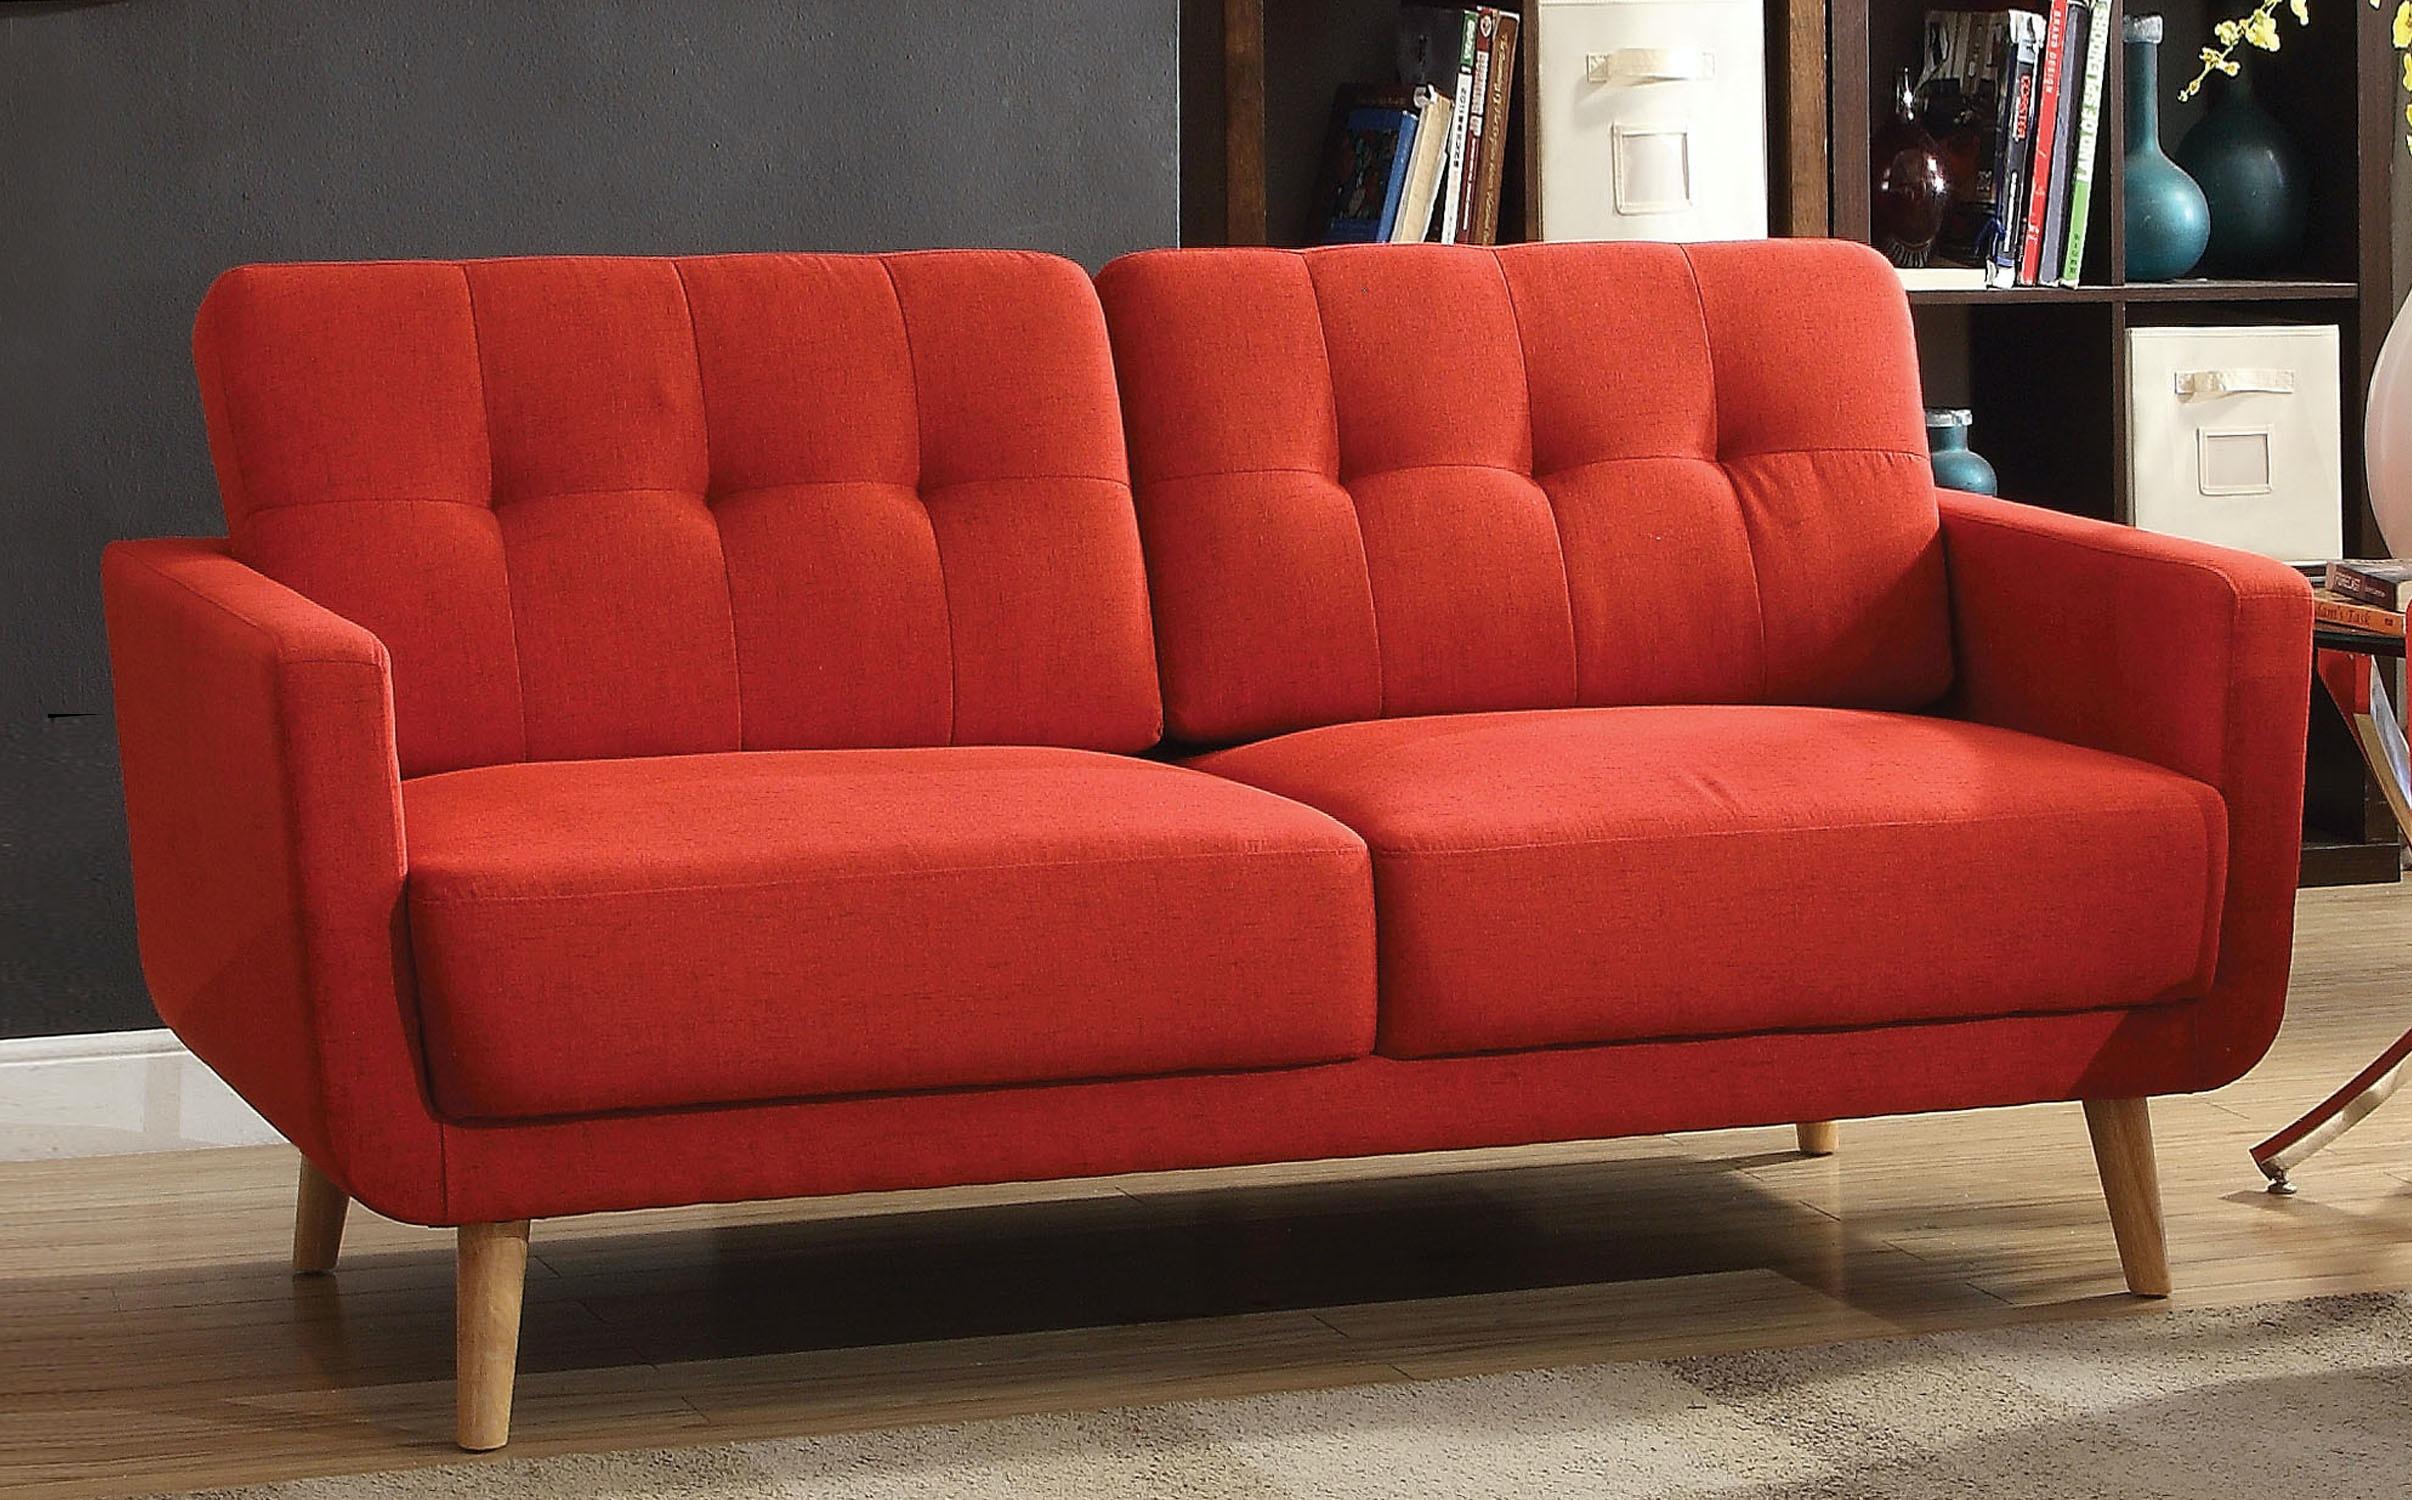 Attirant Acme Furniture Sisilla Sofa 52660